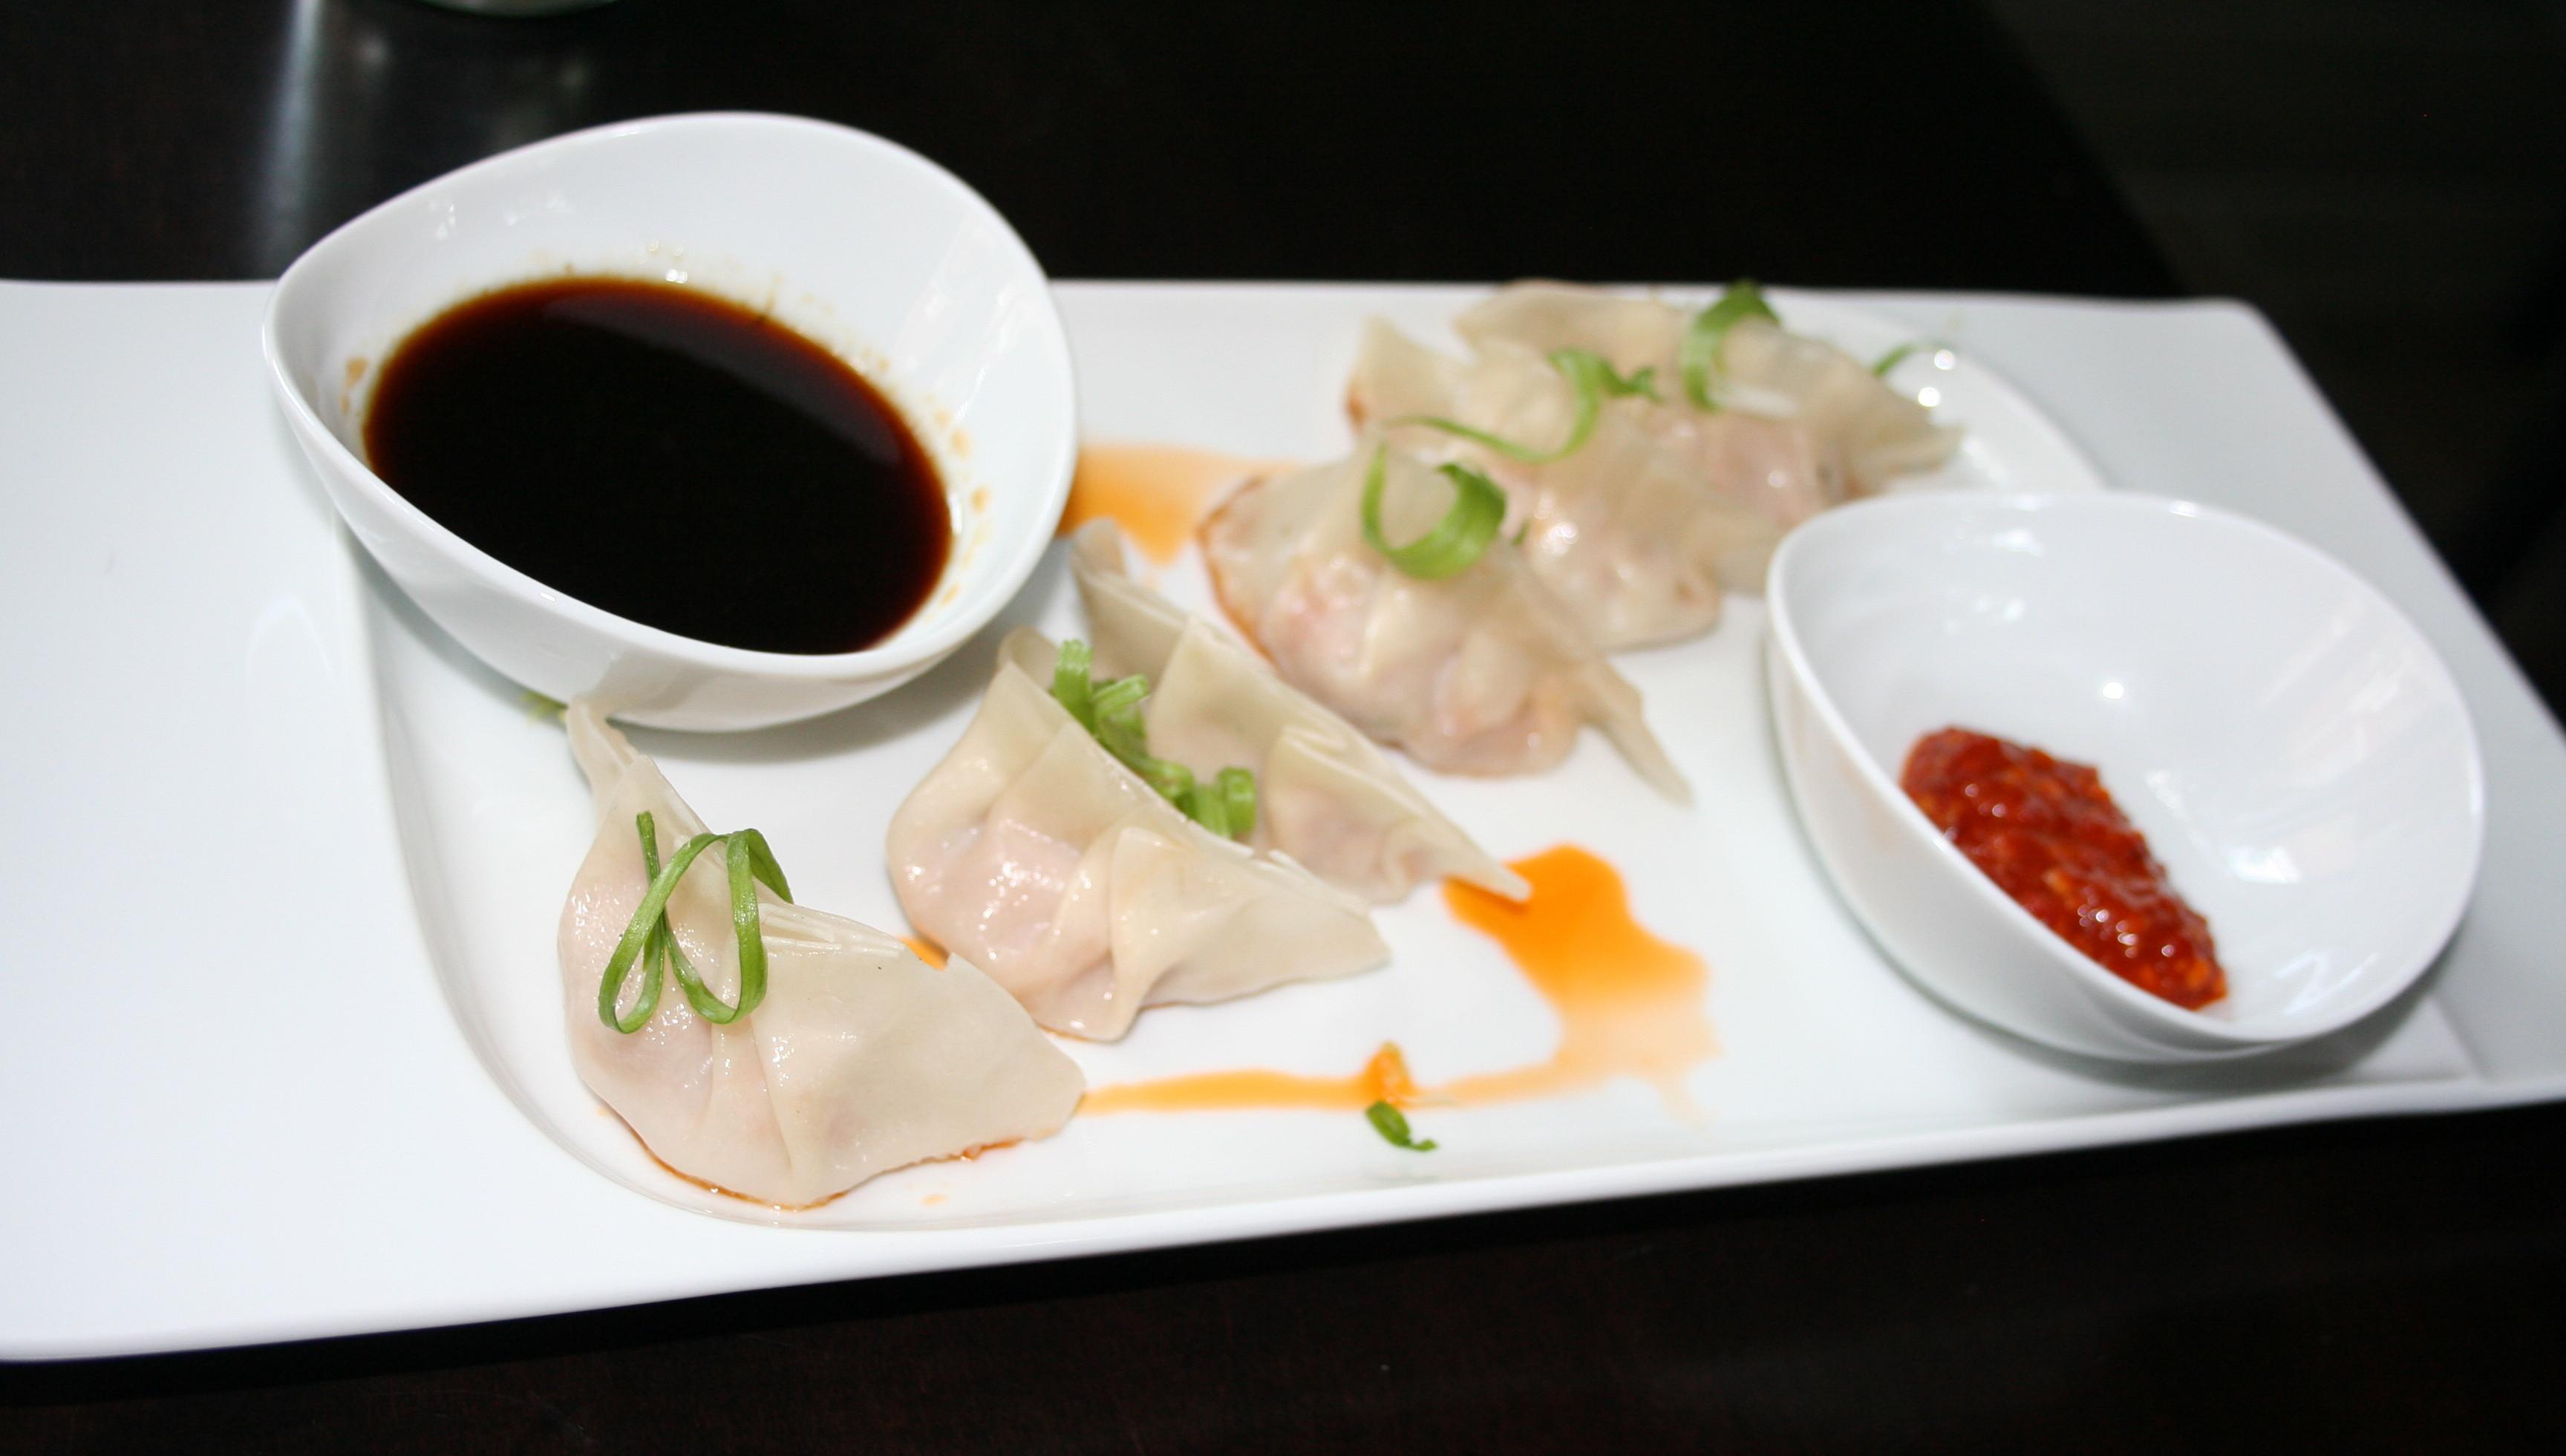 Shrimp and pork dumplings (Photo: Mark Heckathorn/DC on Heels)